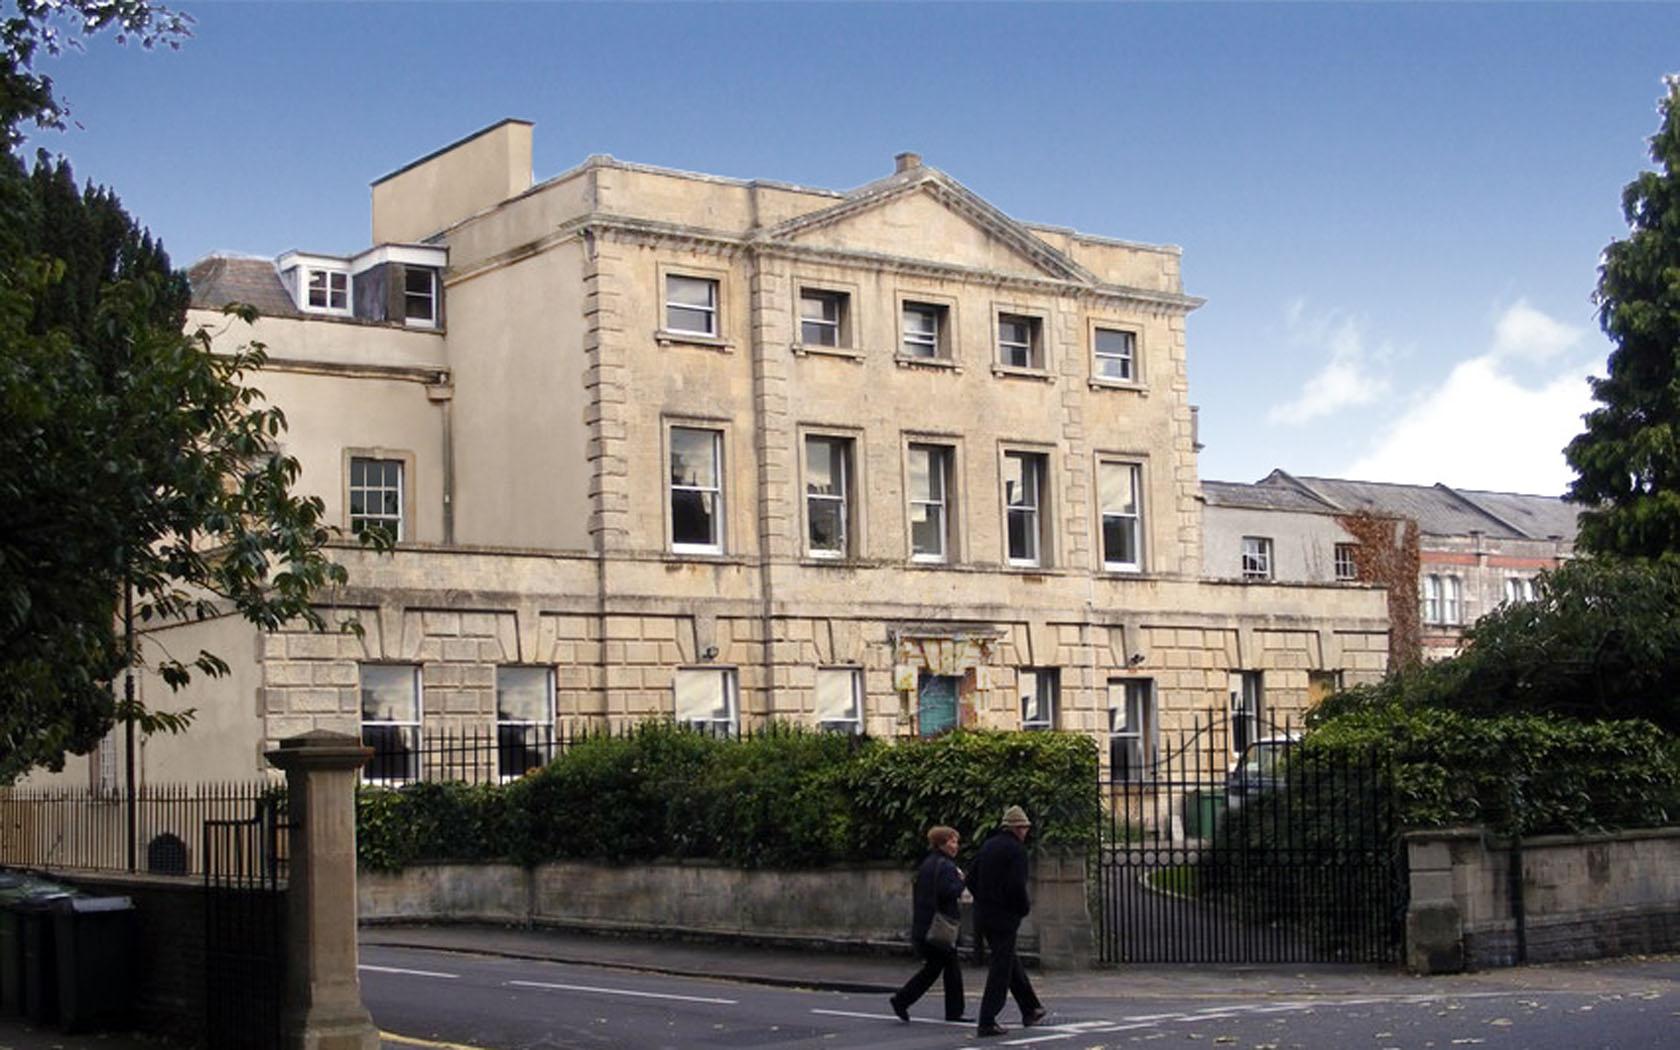 Photograph of Mortimer House entrance